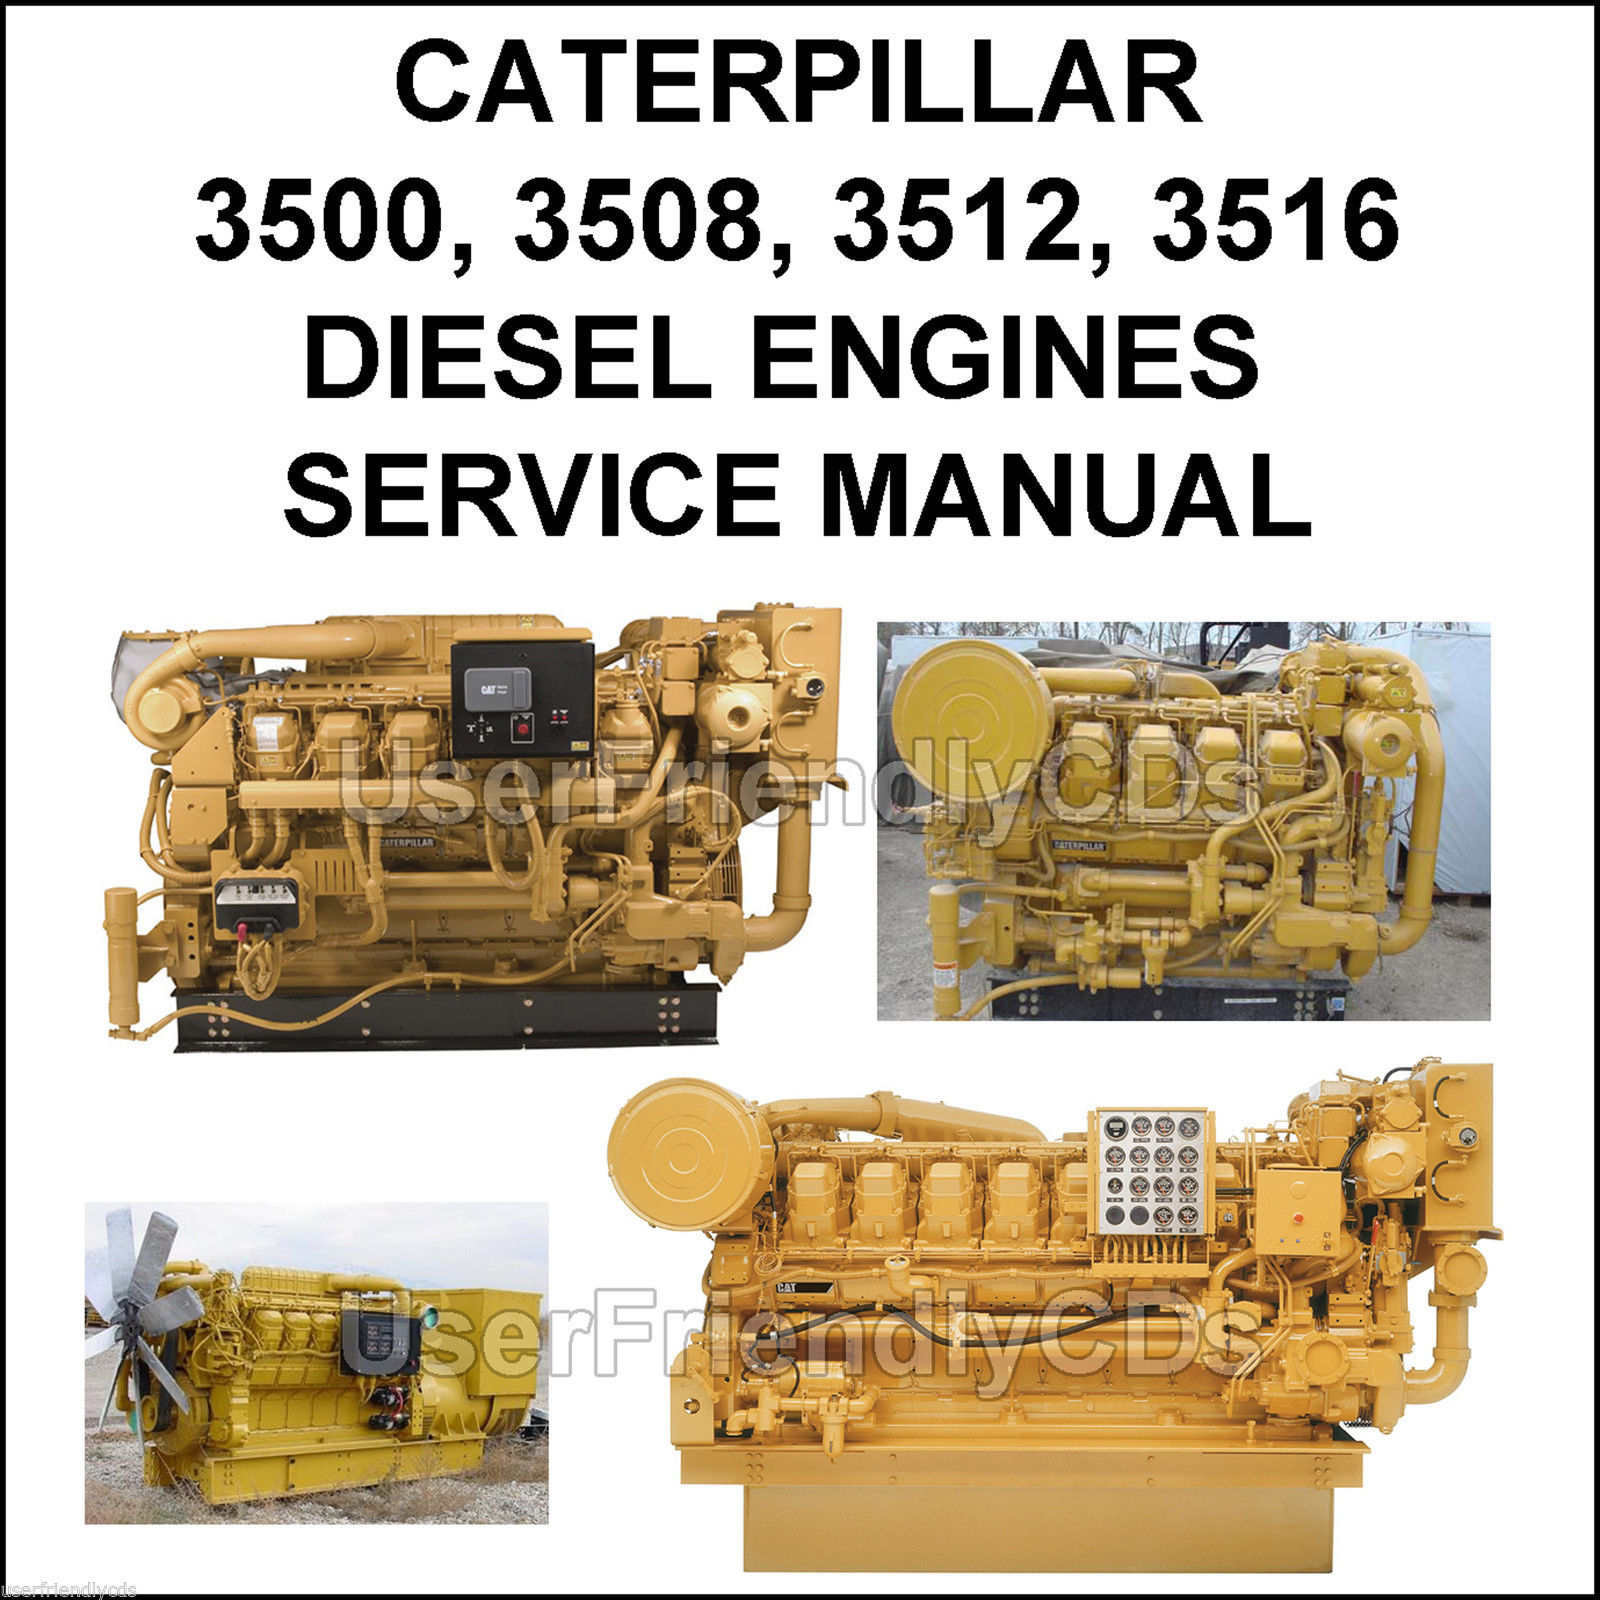 cat 3508 parts manual pdf motorjdi org rh motorjdi org Caterpillar Parts Book Caterpillar Replacement Parts